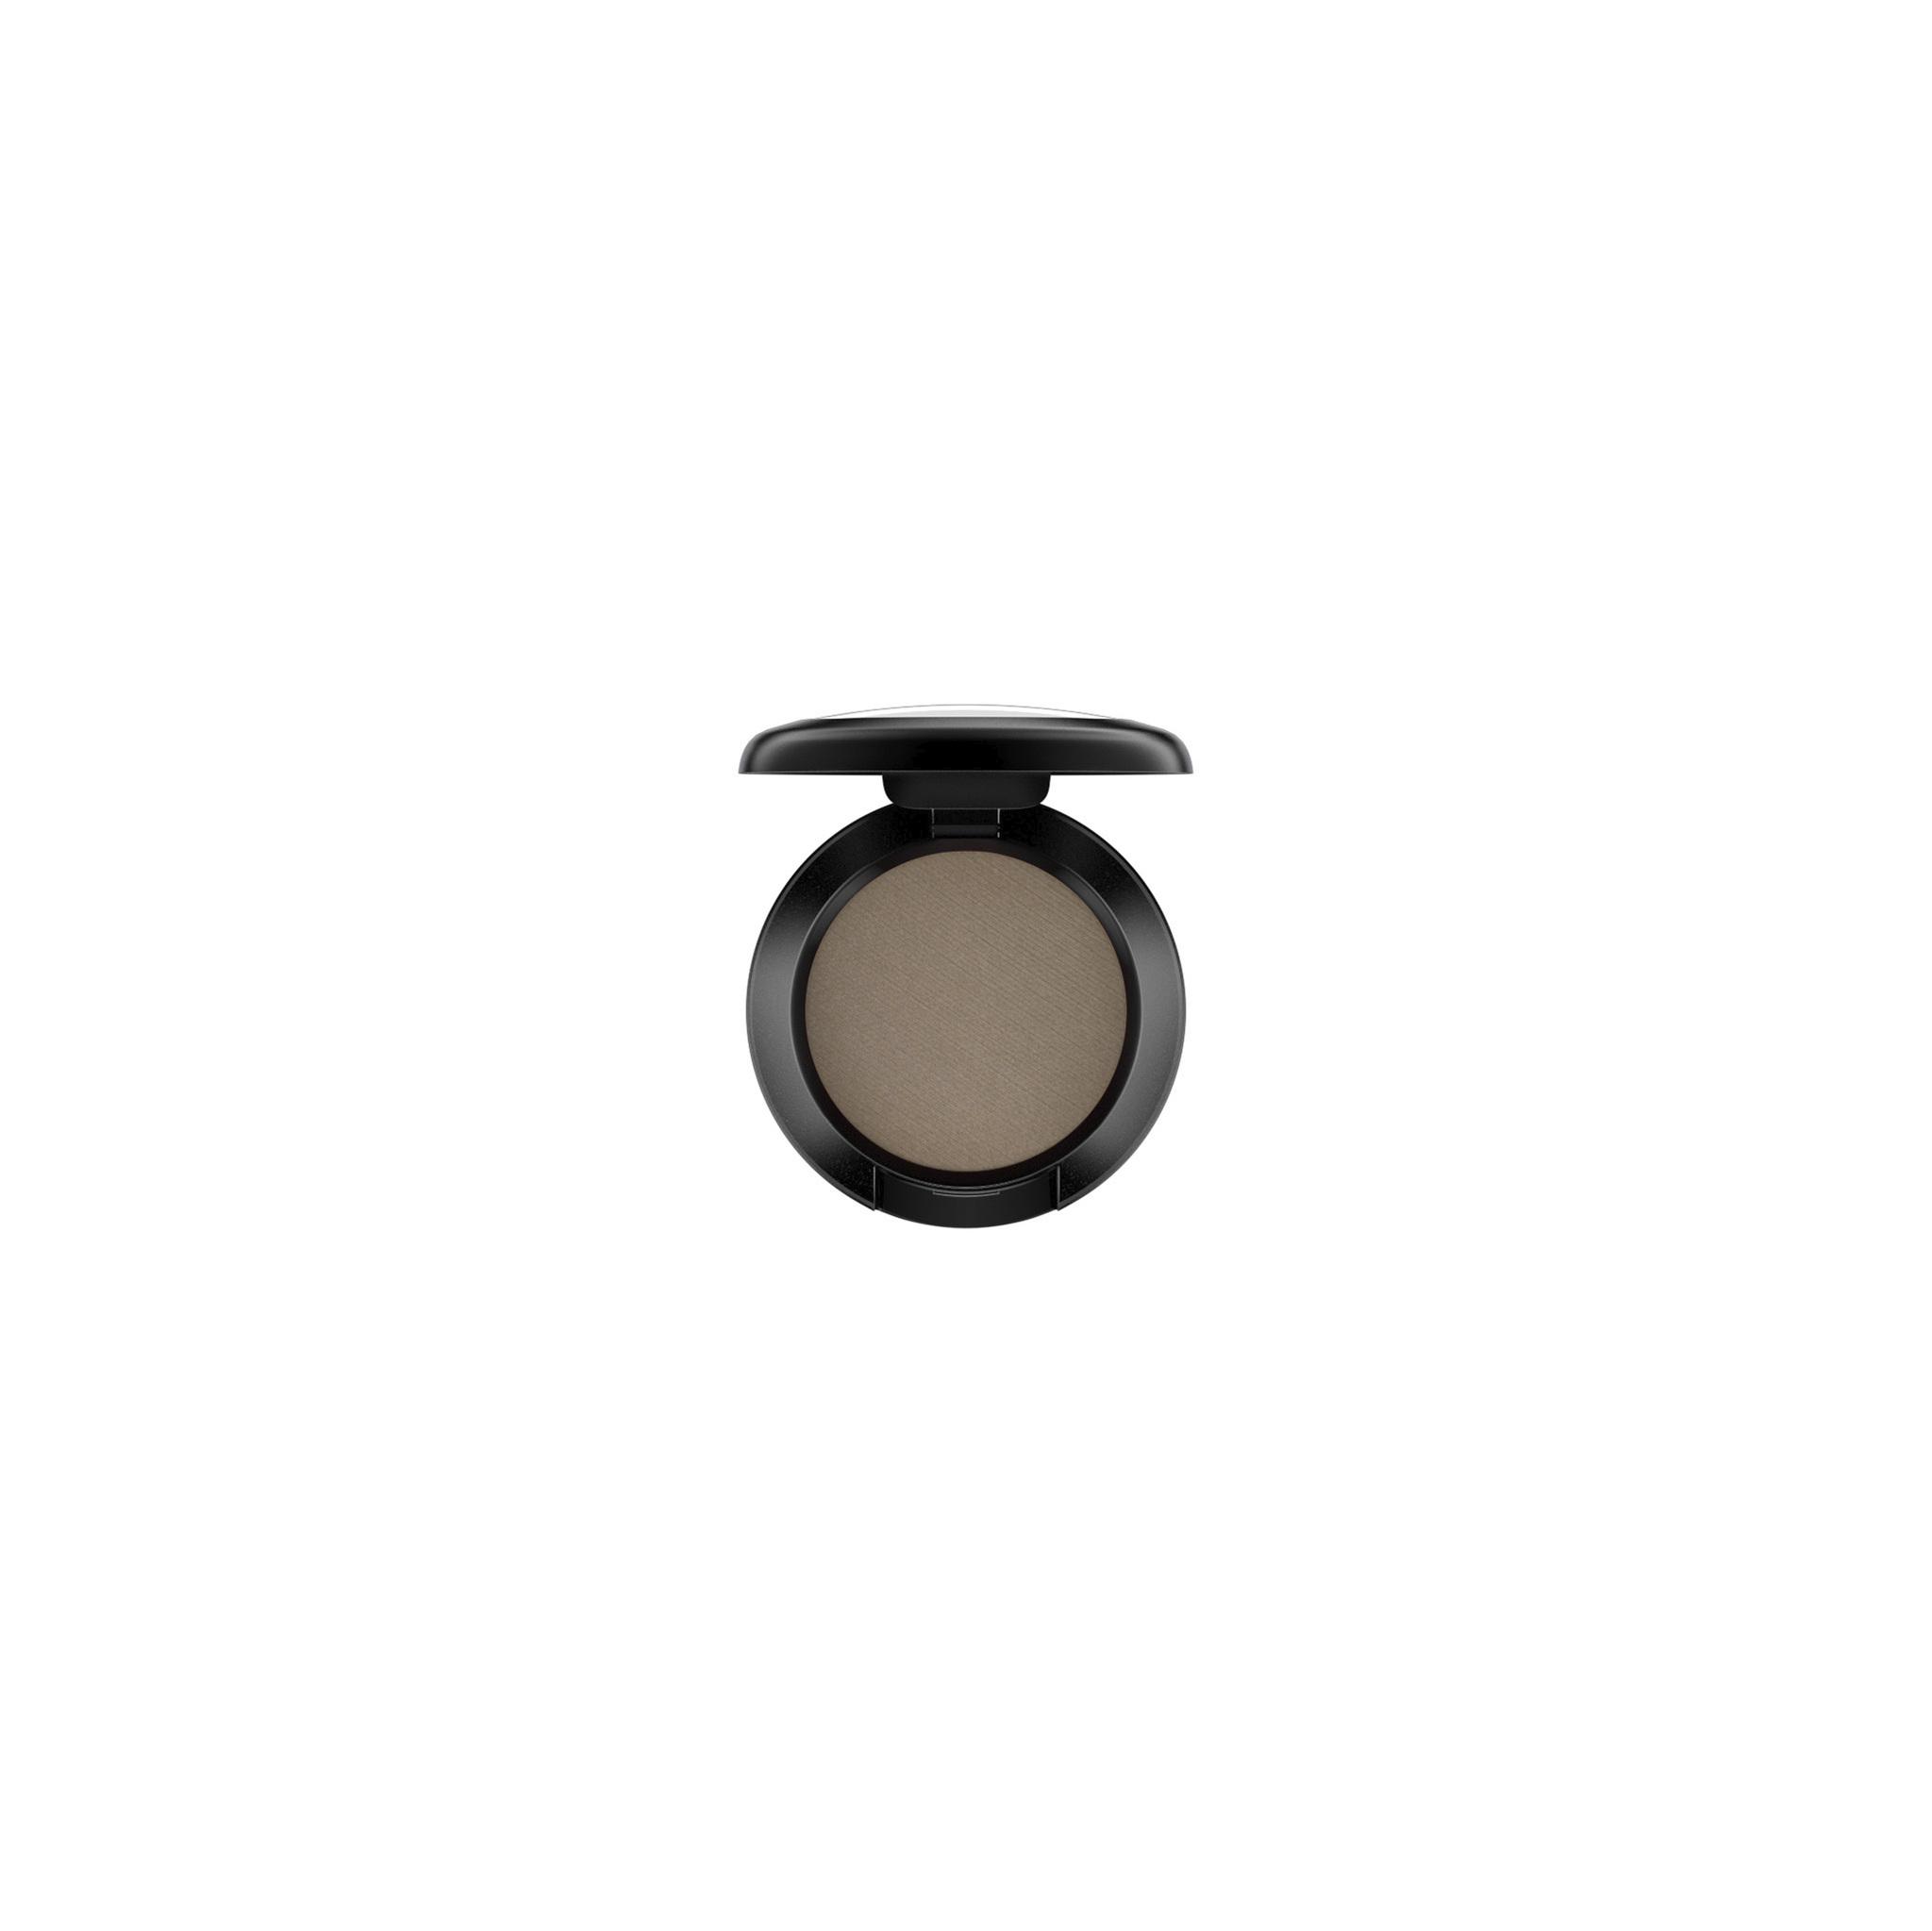 MAC Eye Shadow, coquette